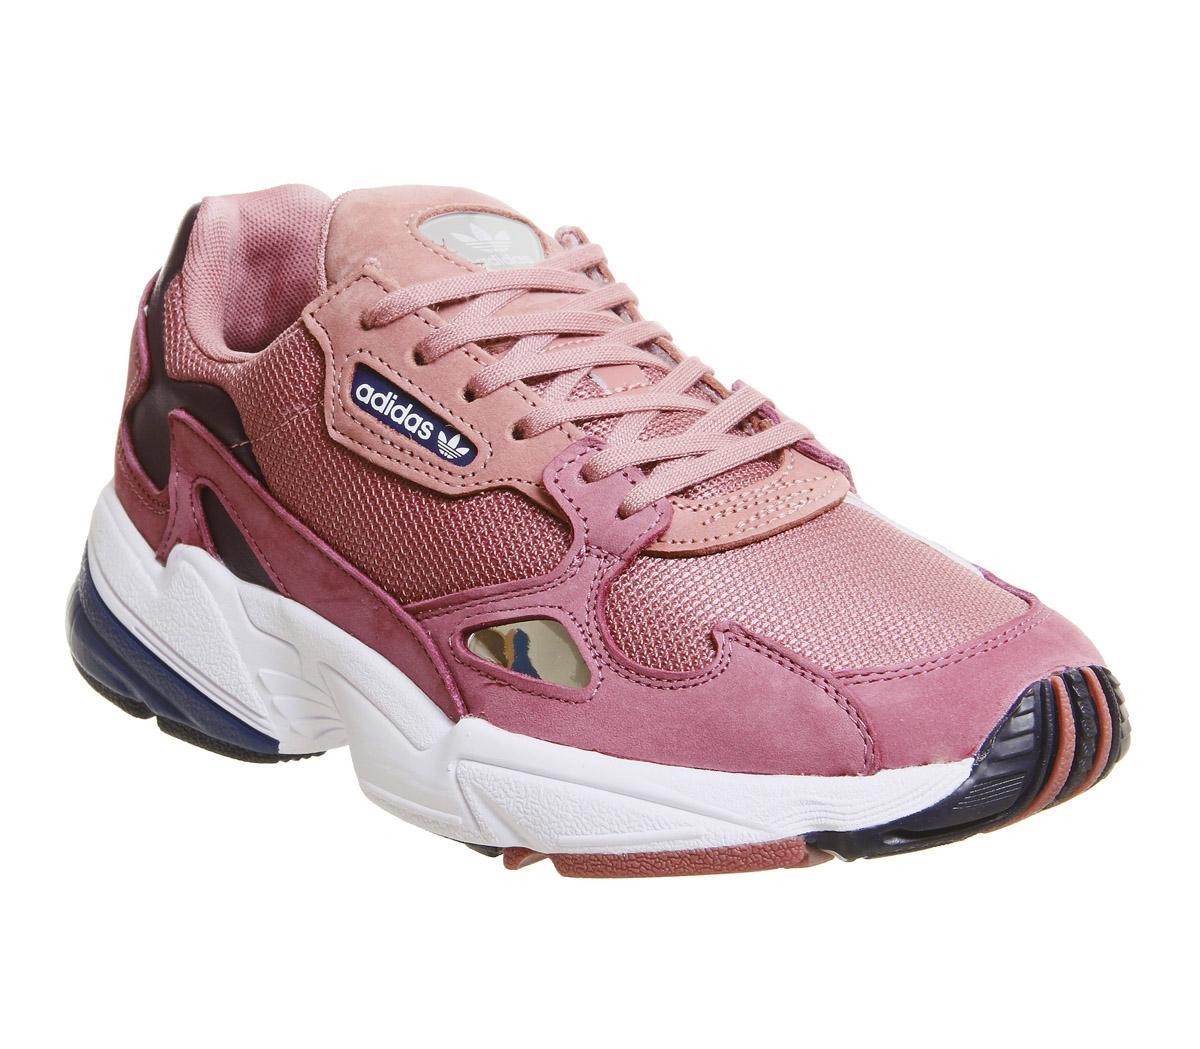 adidas Falcon Trainers Pink Dark Blue